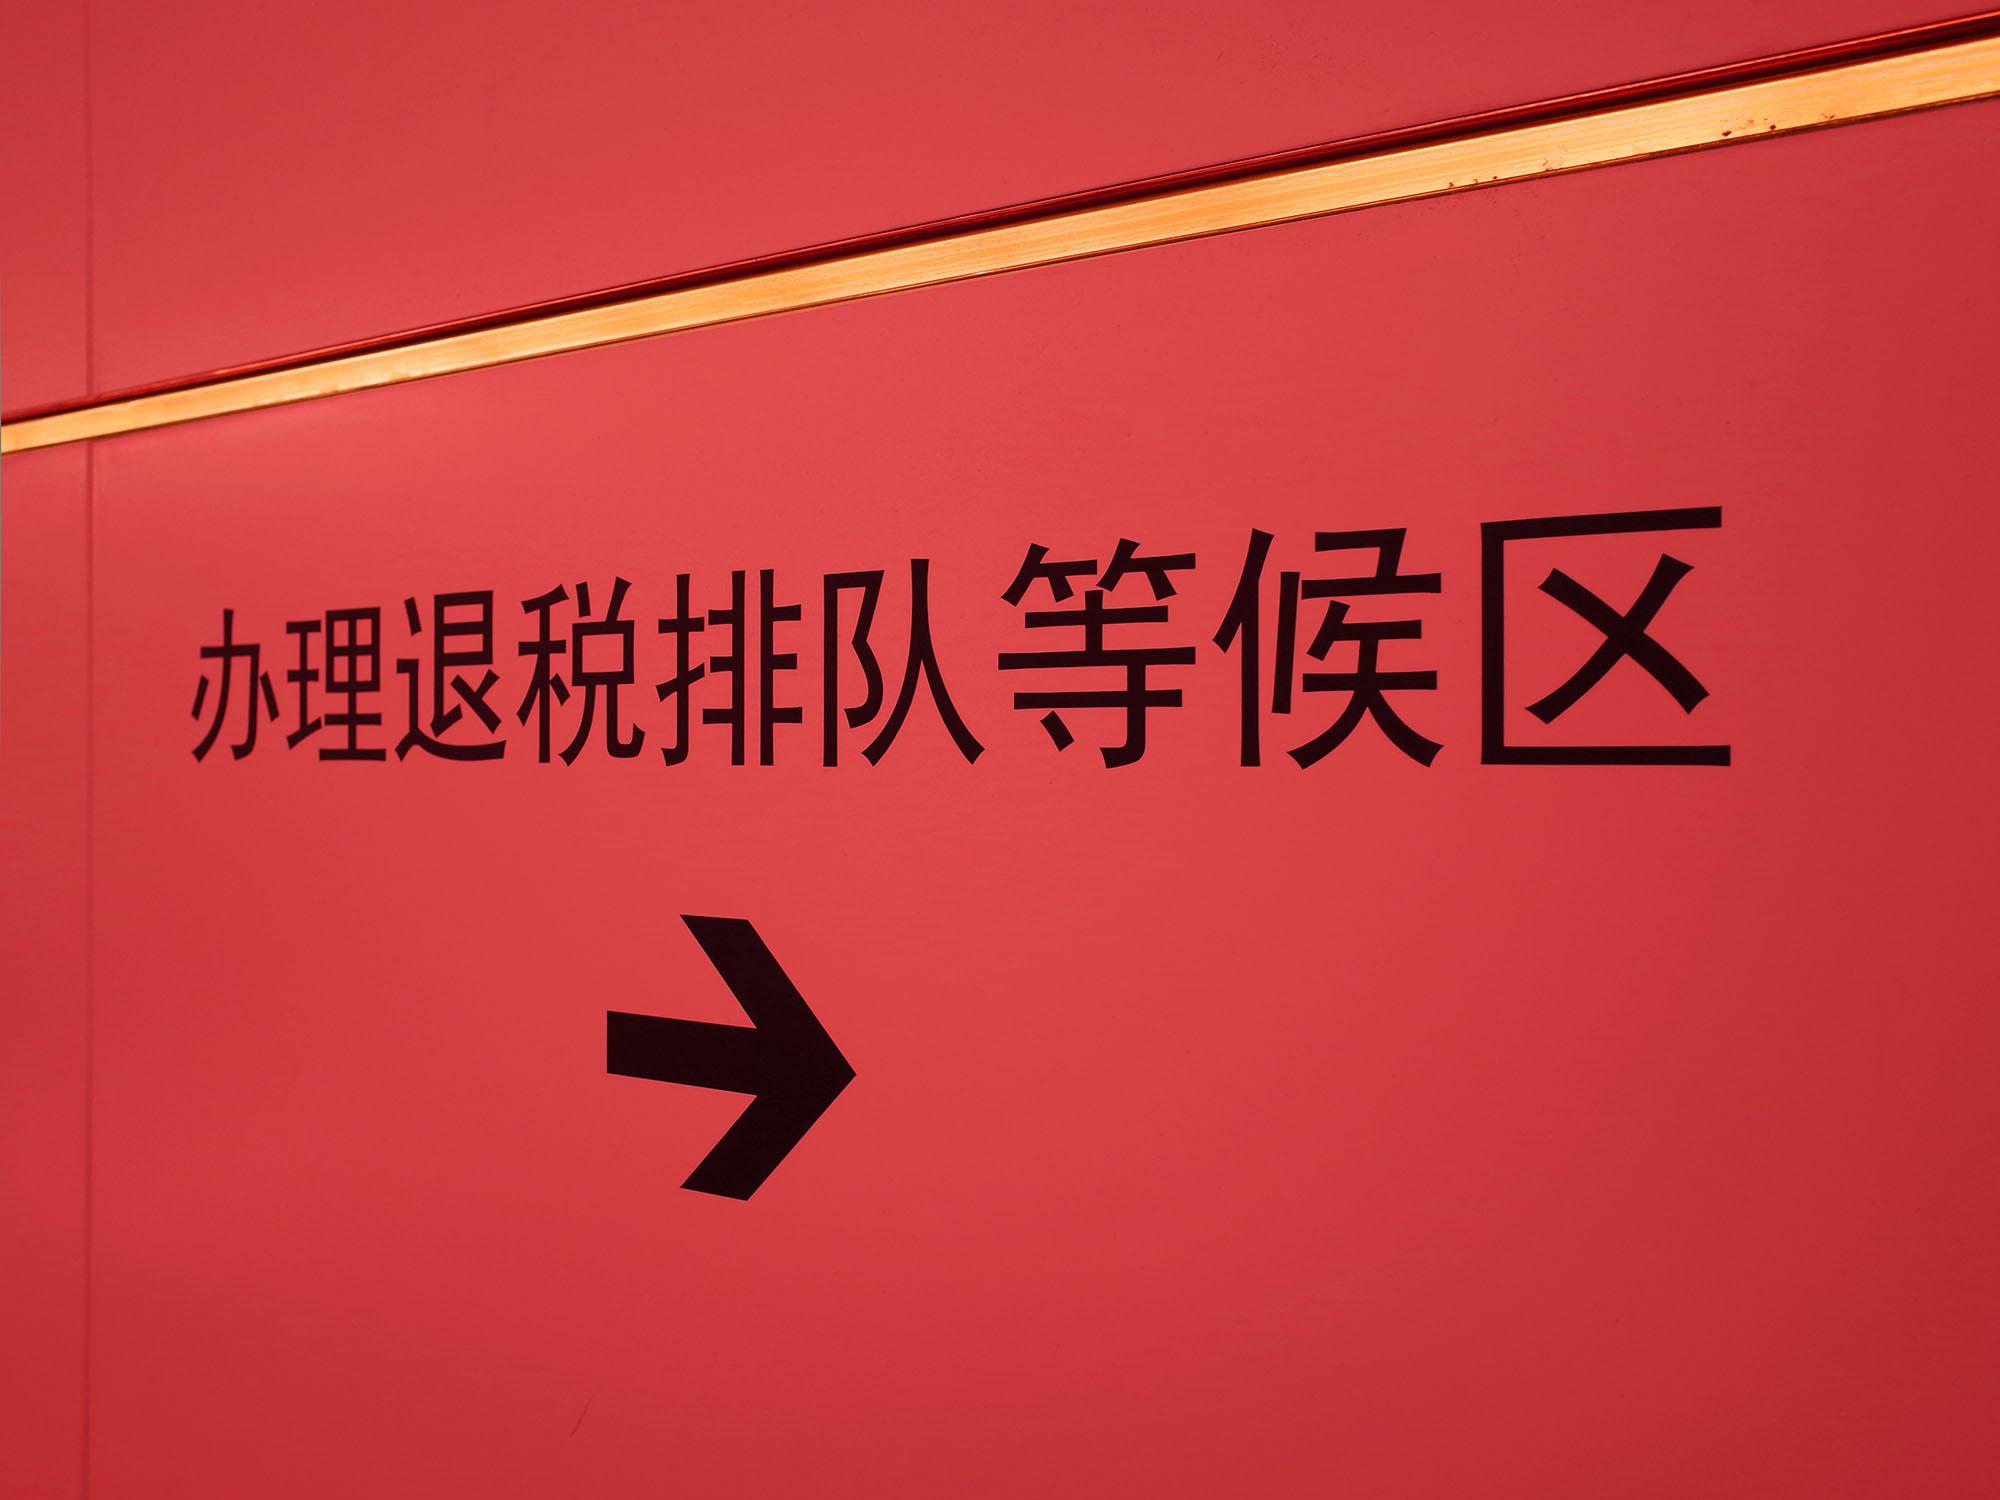 inscription en chinois